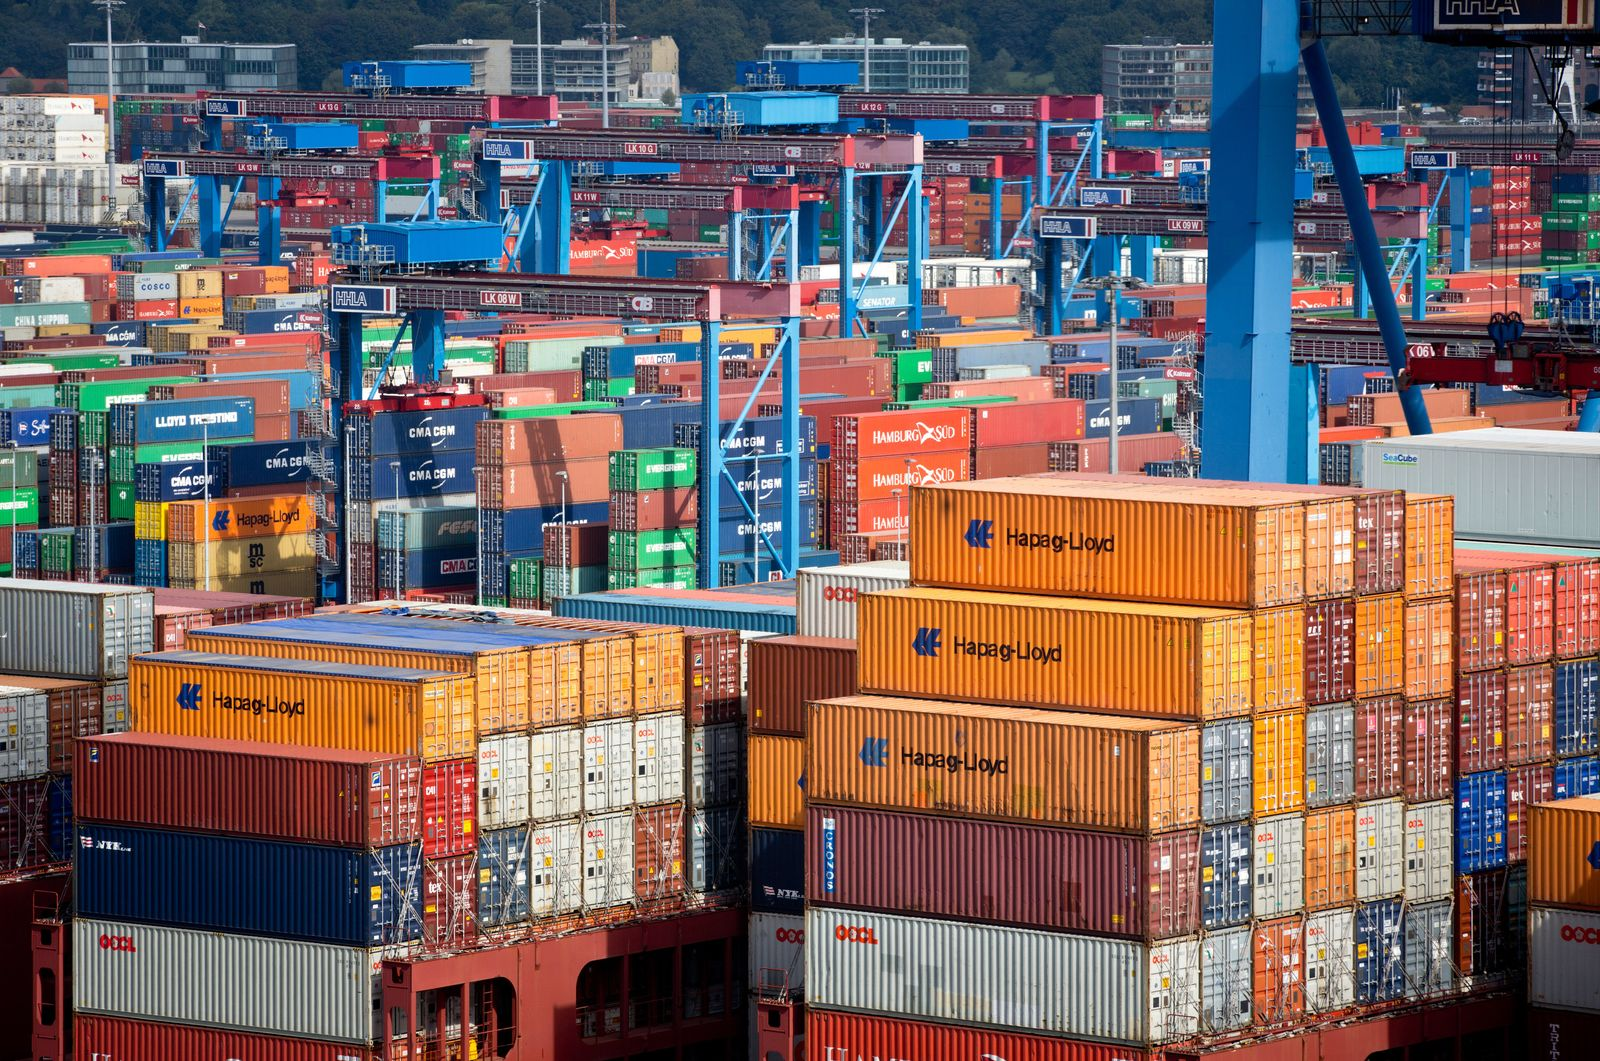 50 Jahre Container / Containerhafen